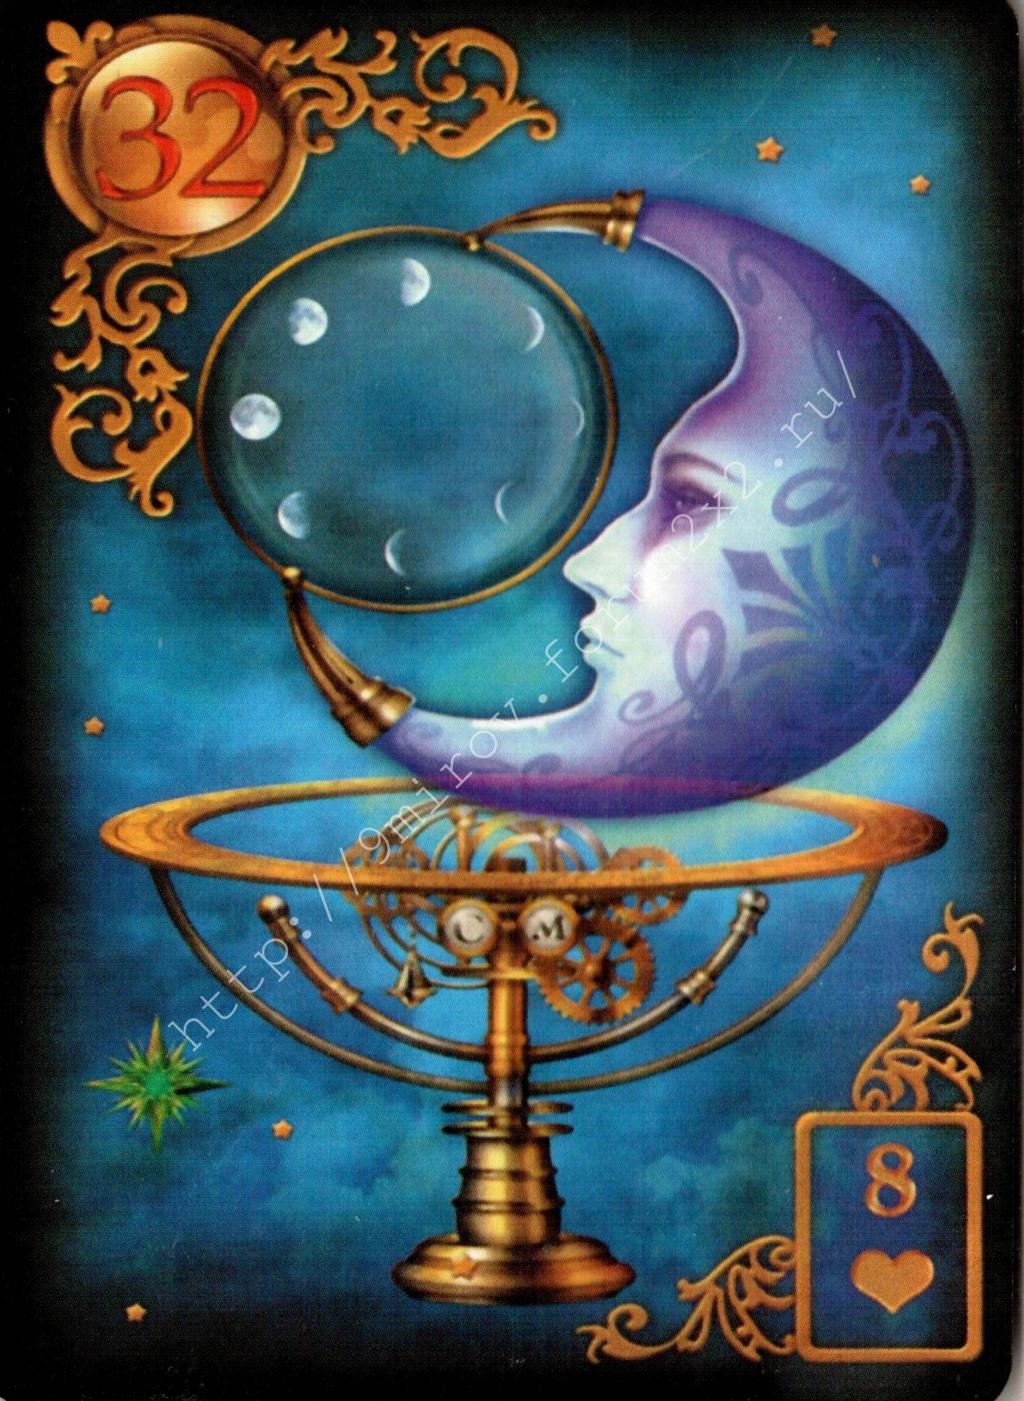 Золотые мечты Ленорман (Расширенное издание) | Gilded Reverie Lenormand. Галерея.  Water123